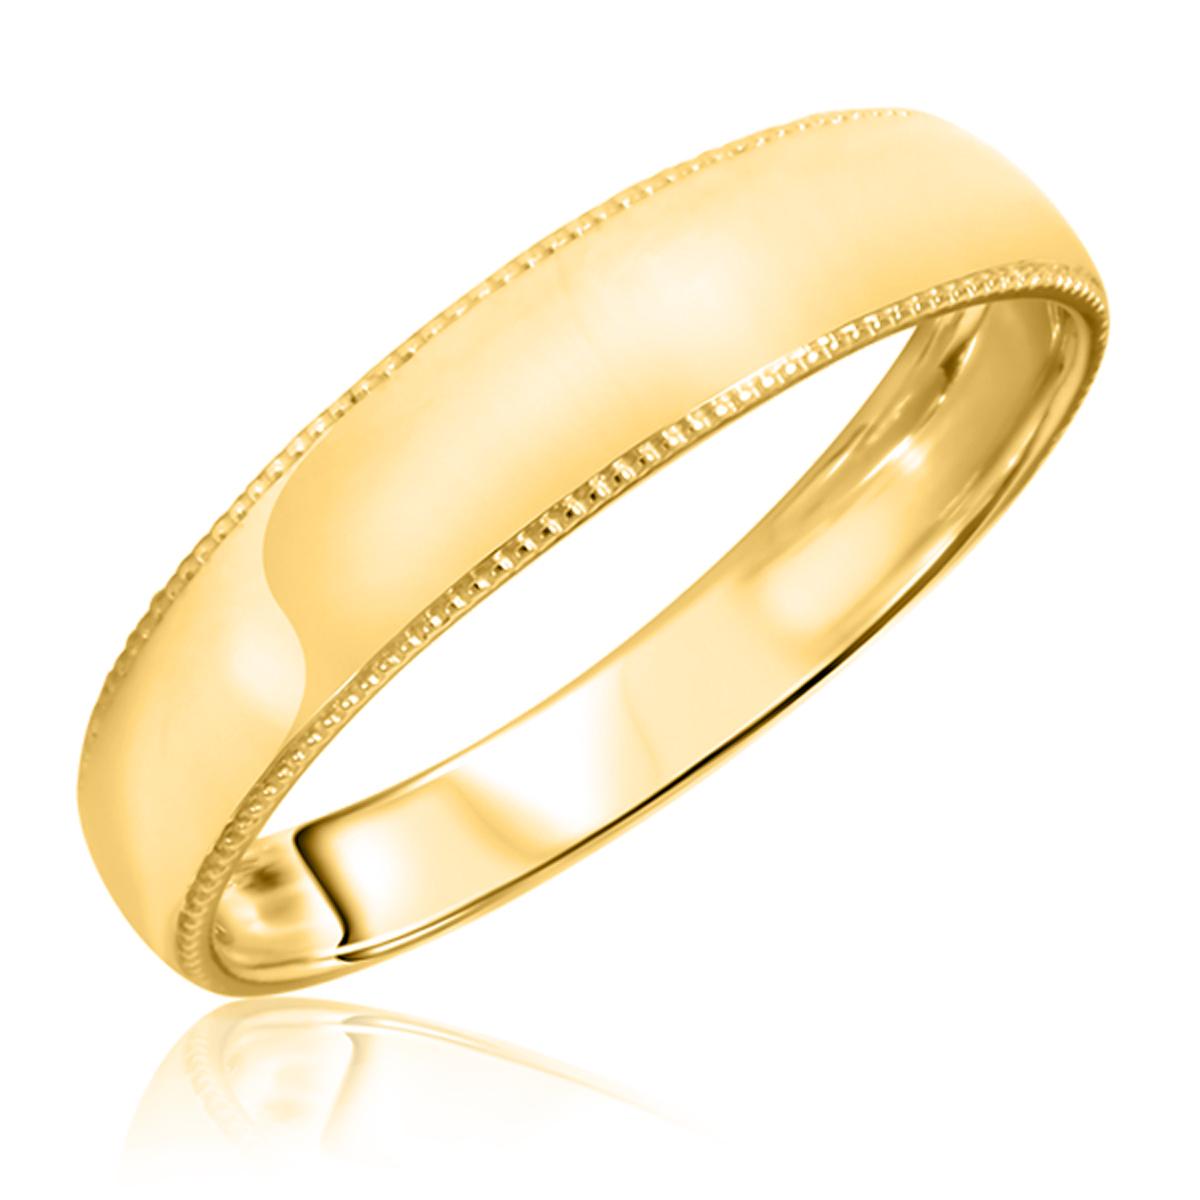 Traditional Milgrain Design, 5 millimeter, 14K Yellow Gold Men's Wedding Band-